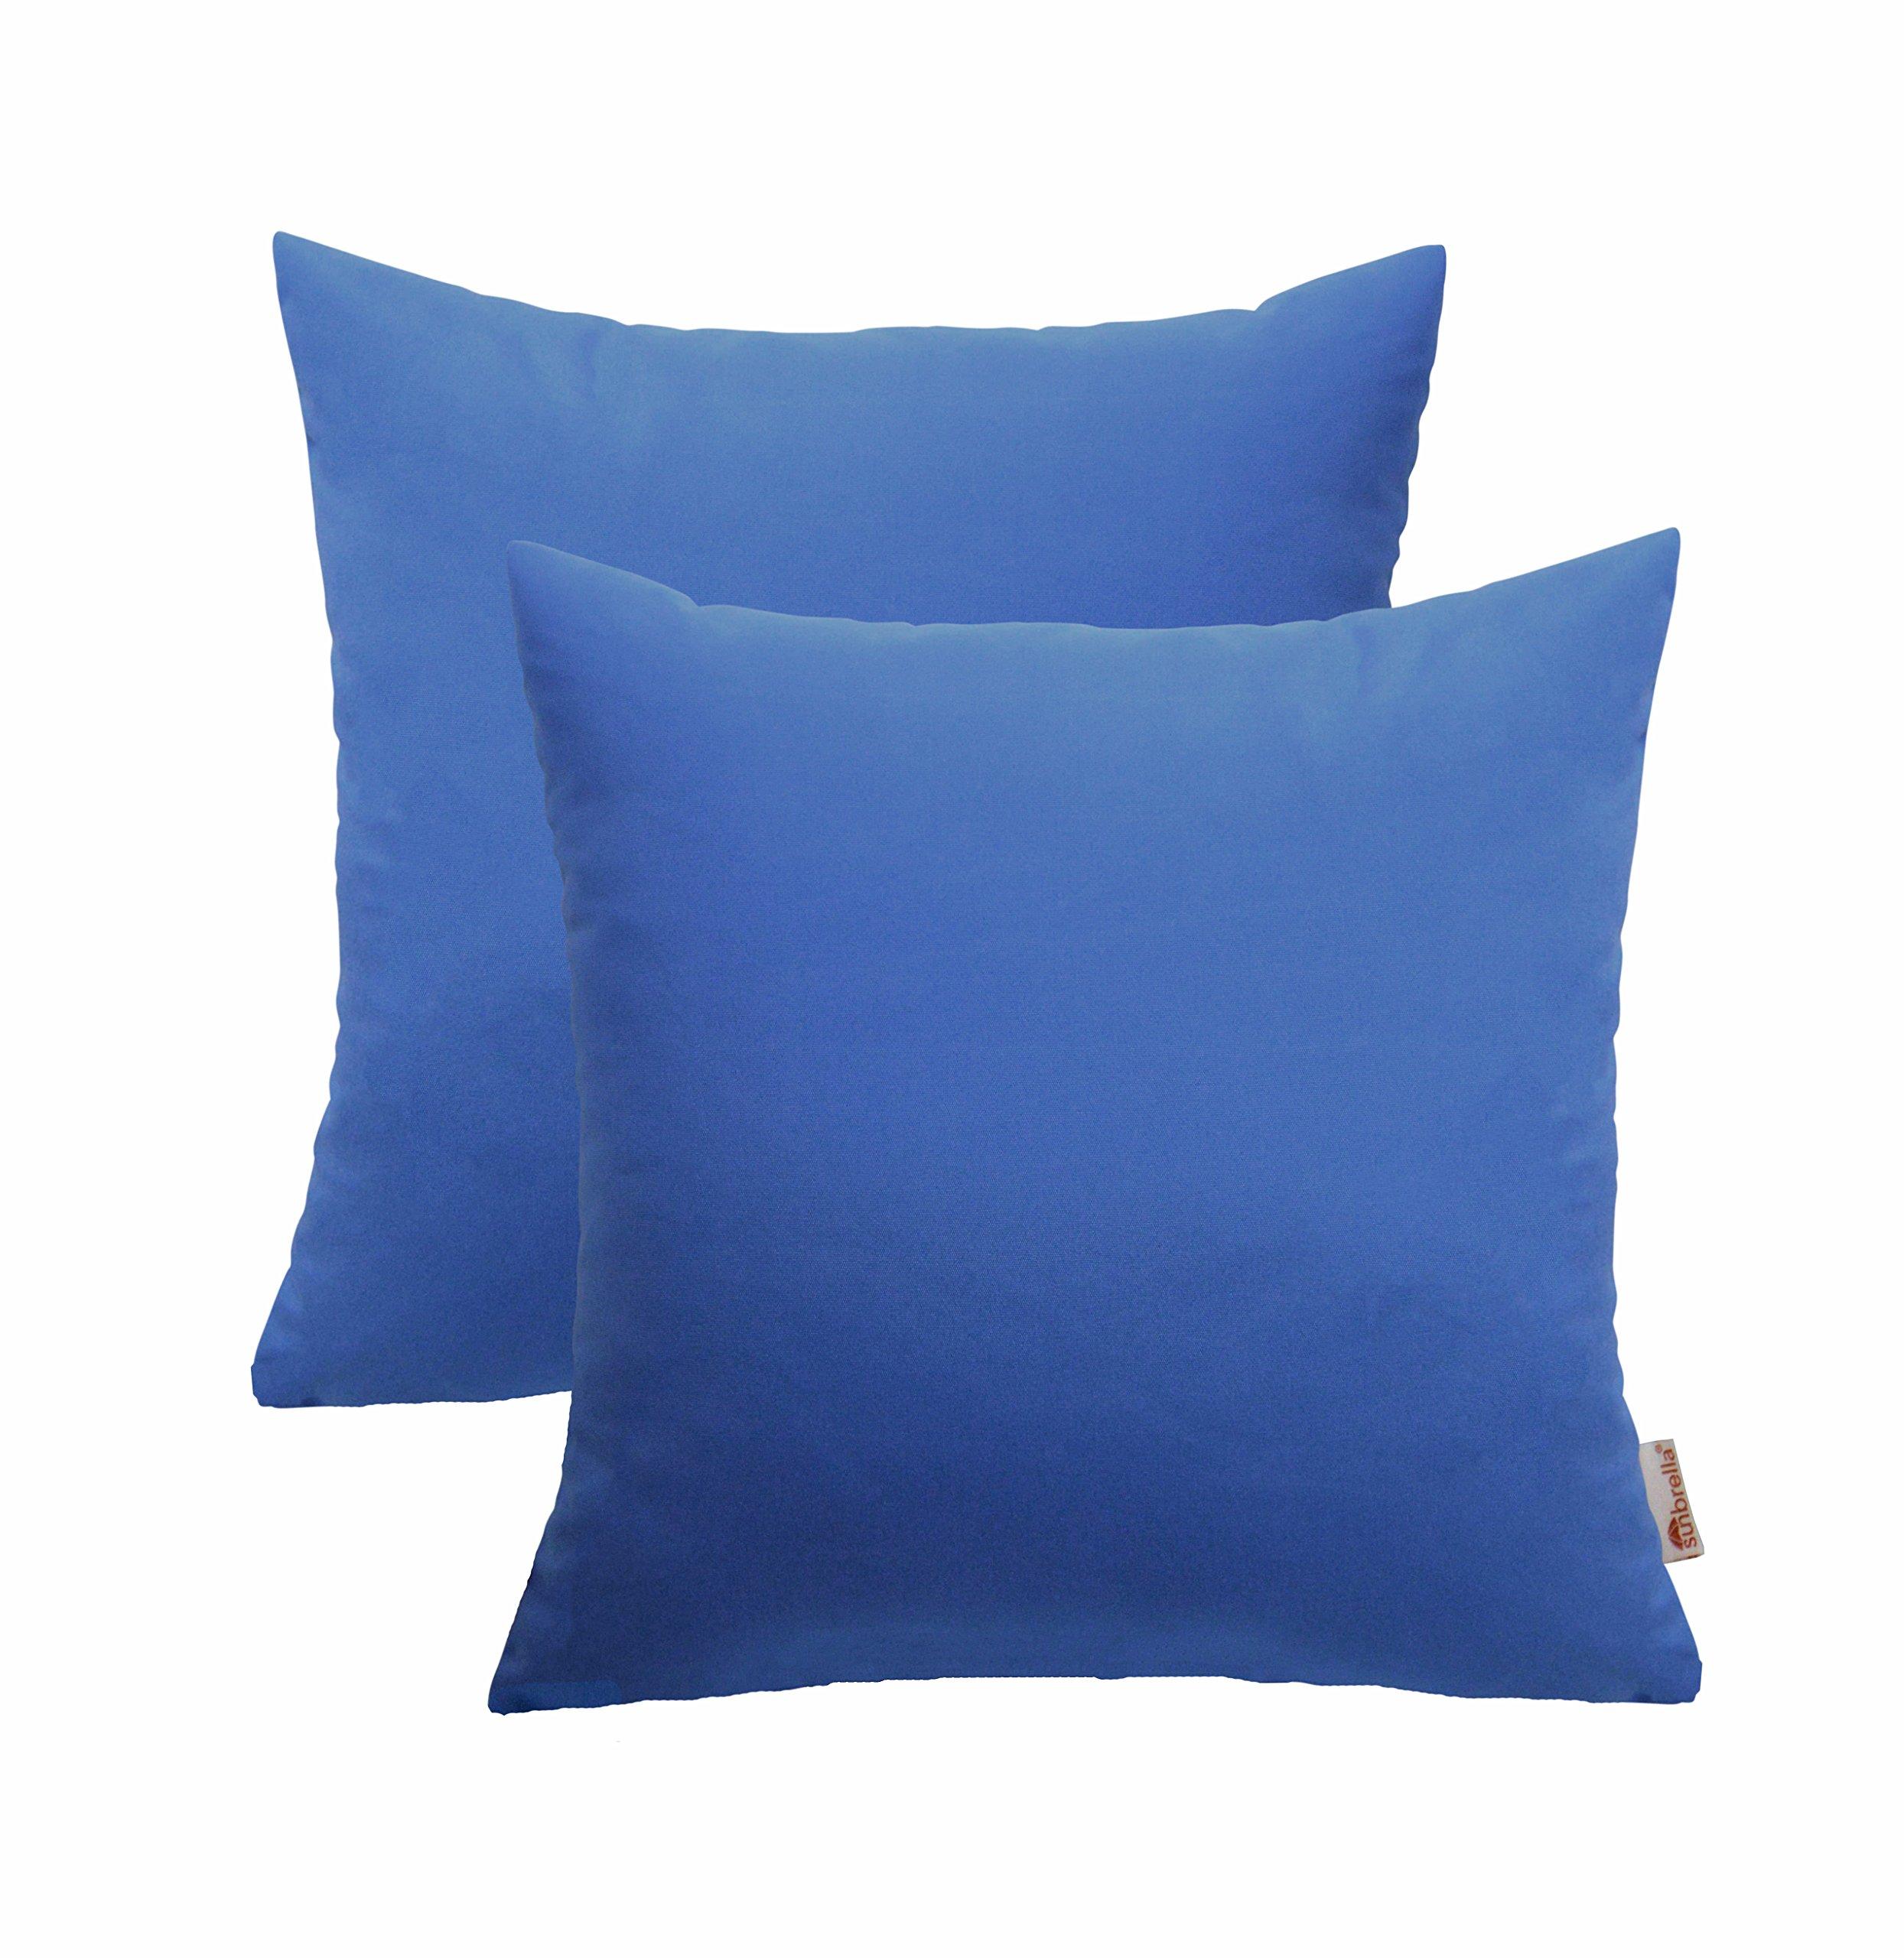 RSH Décor Set of 2 Indoor/Outdoor Decorative Throw Pillows Sunbrella Canvas Capri Blue - 20'' x 20''